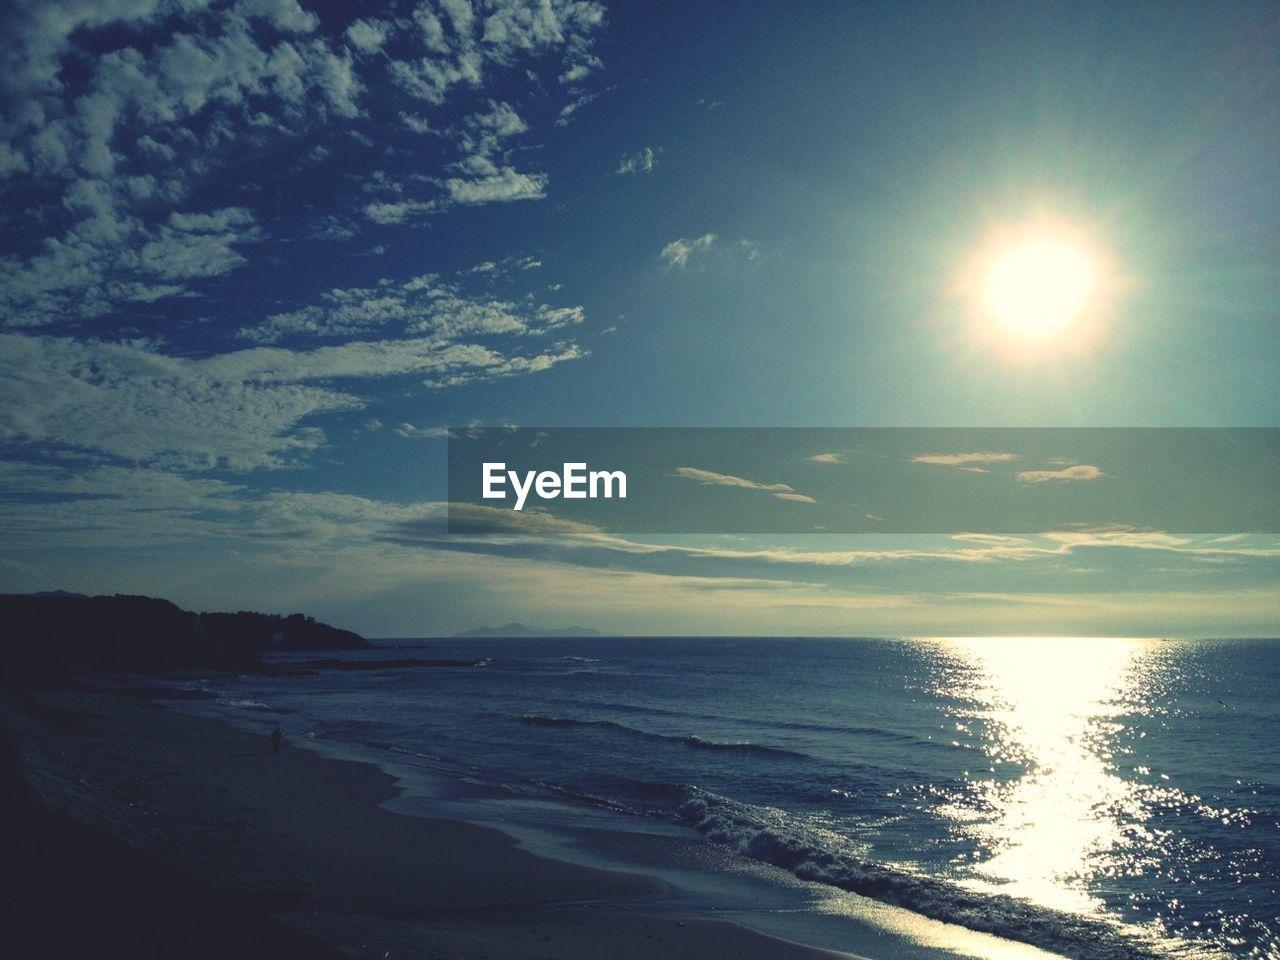 sun, sea, water, nature, sunlight, bright, beauty in nature, scenics, sunset, sky, beach, no people, outdoors